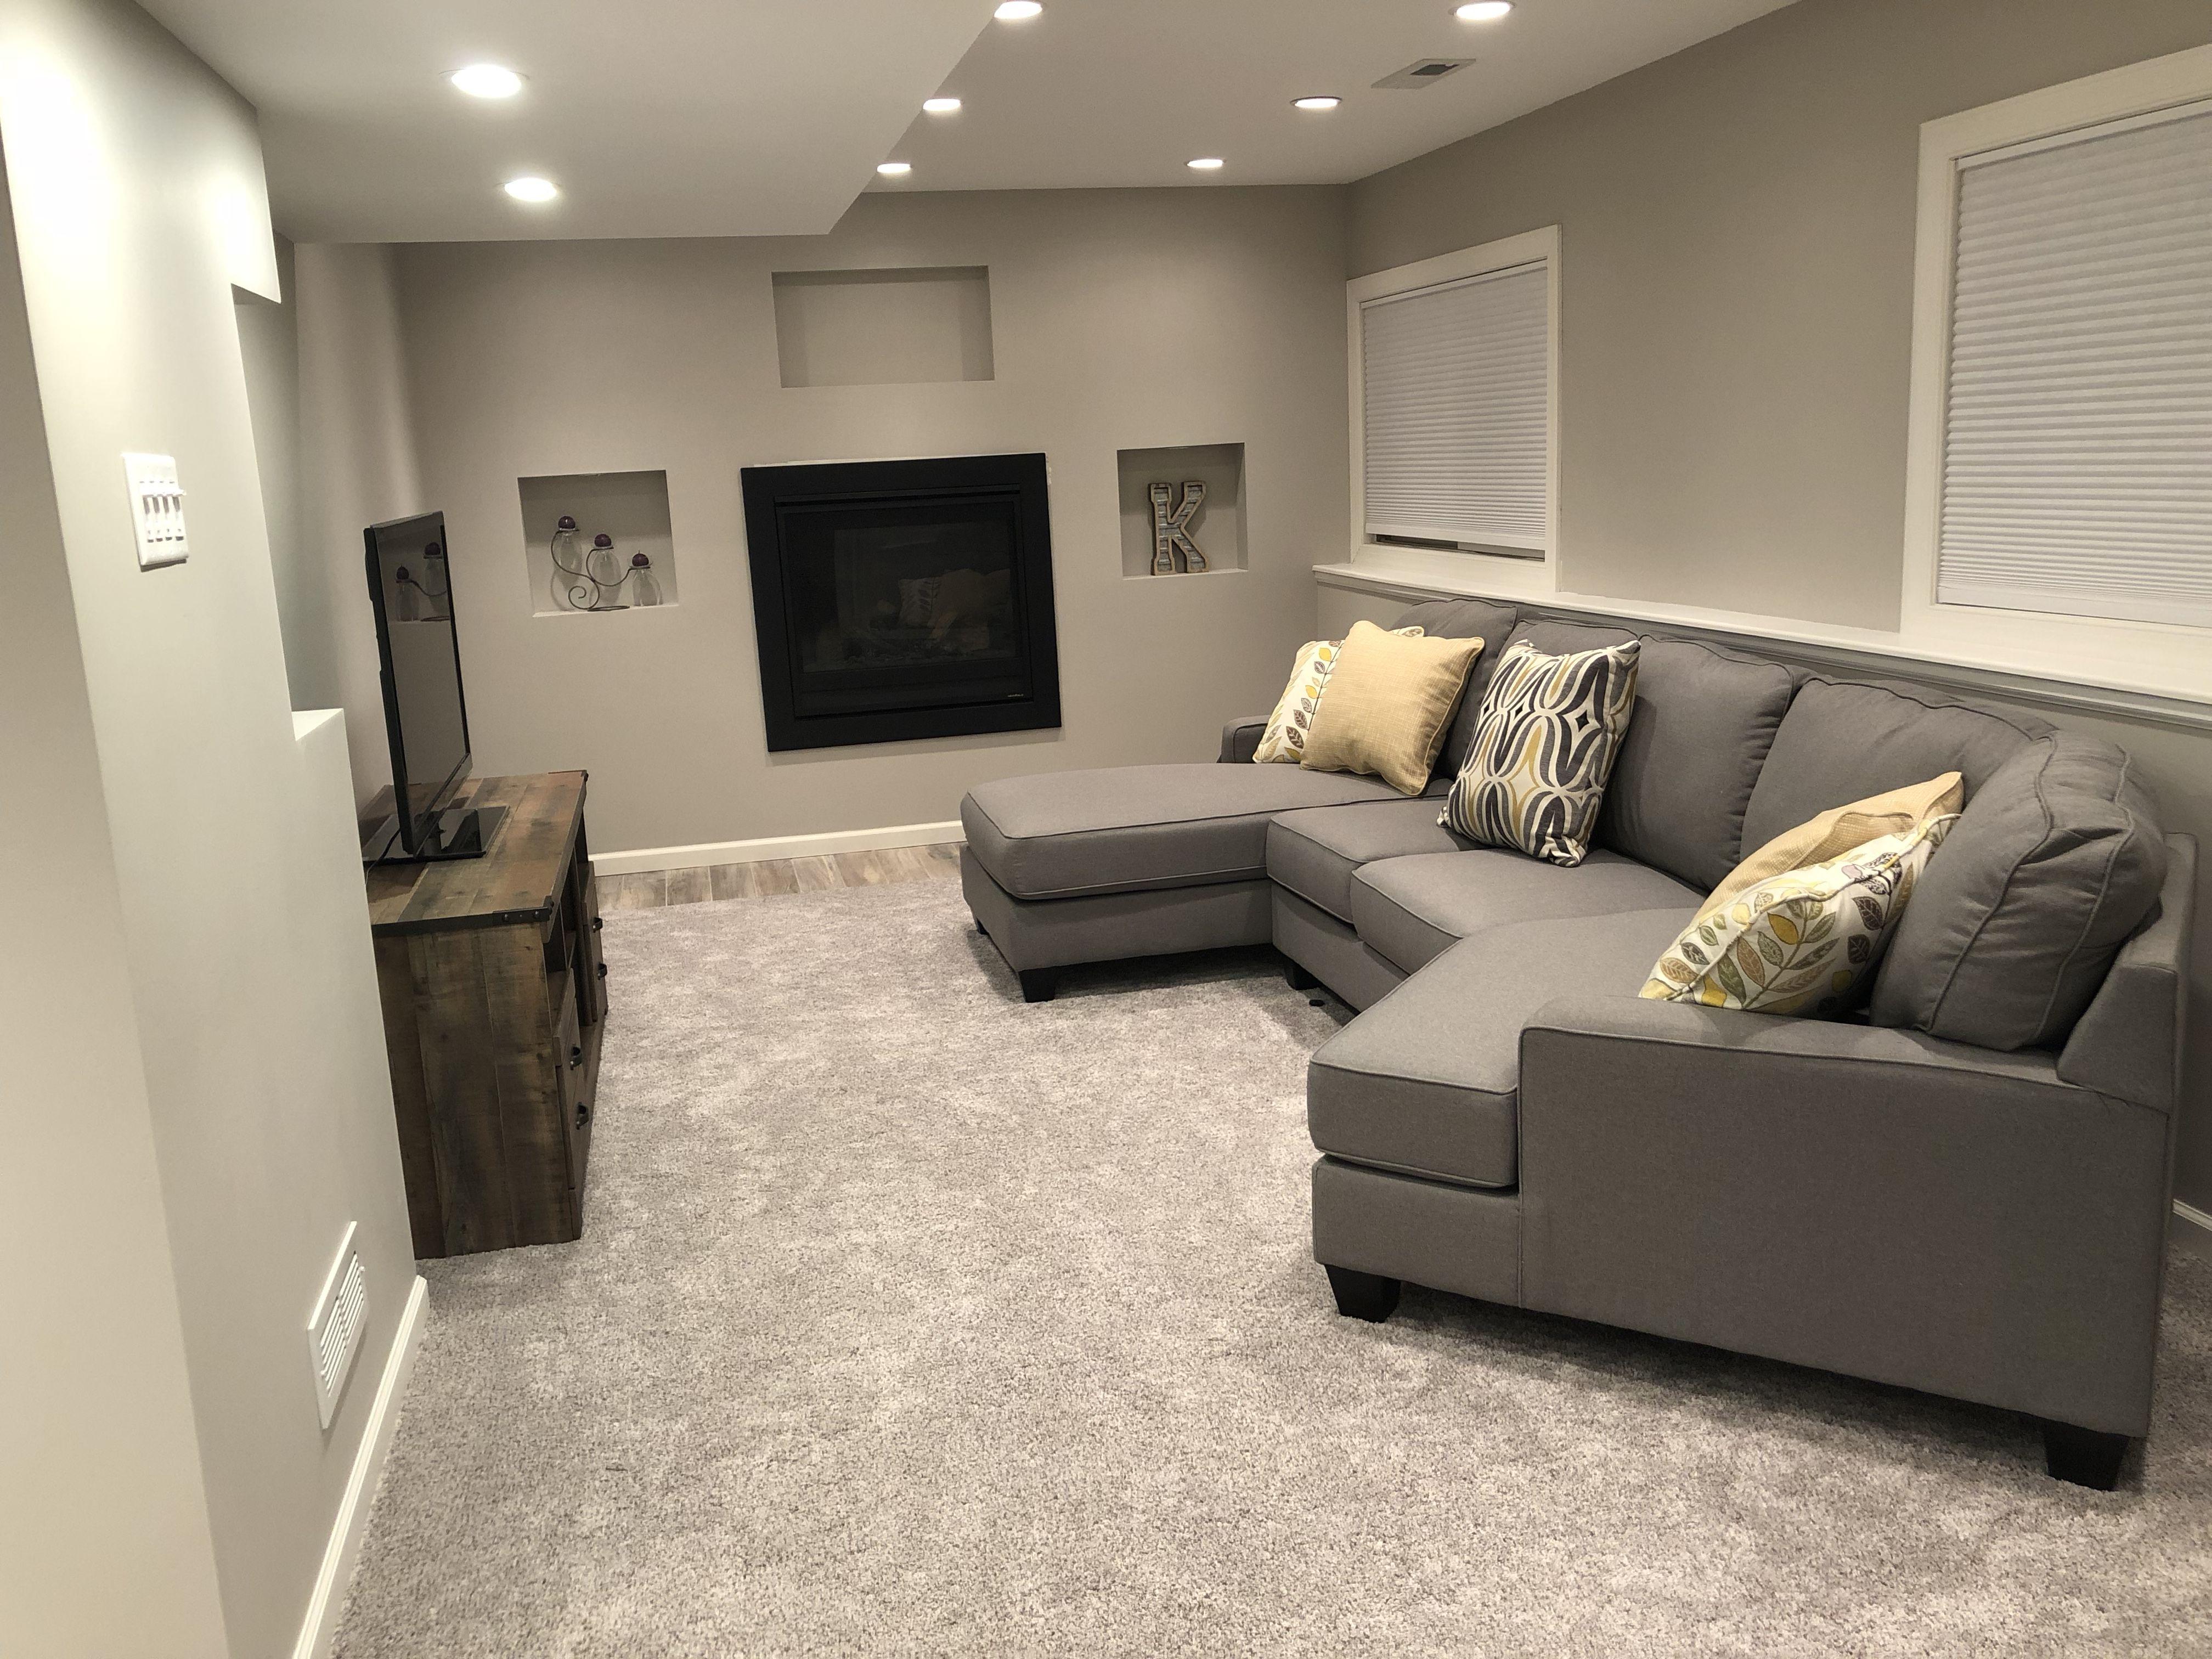 Long Narrow Basement Family Room Minimalist Gray Sectional Basement Living Rooms Small Basement Remodel Long Narrow Living Room